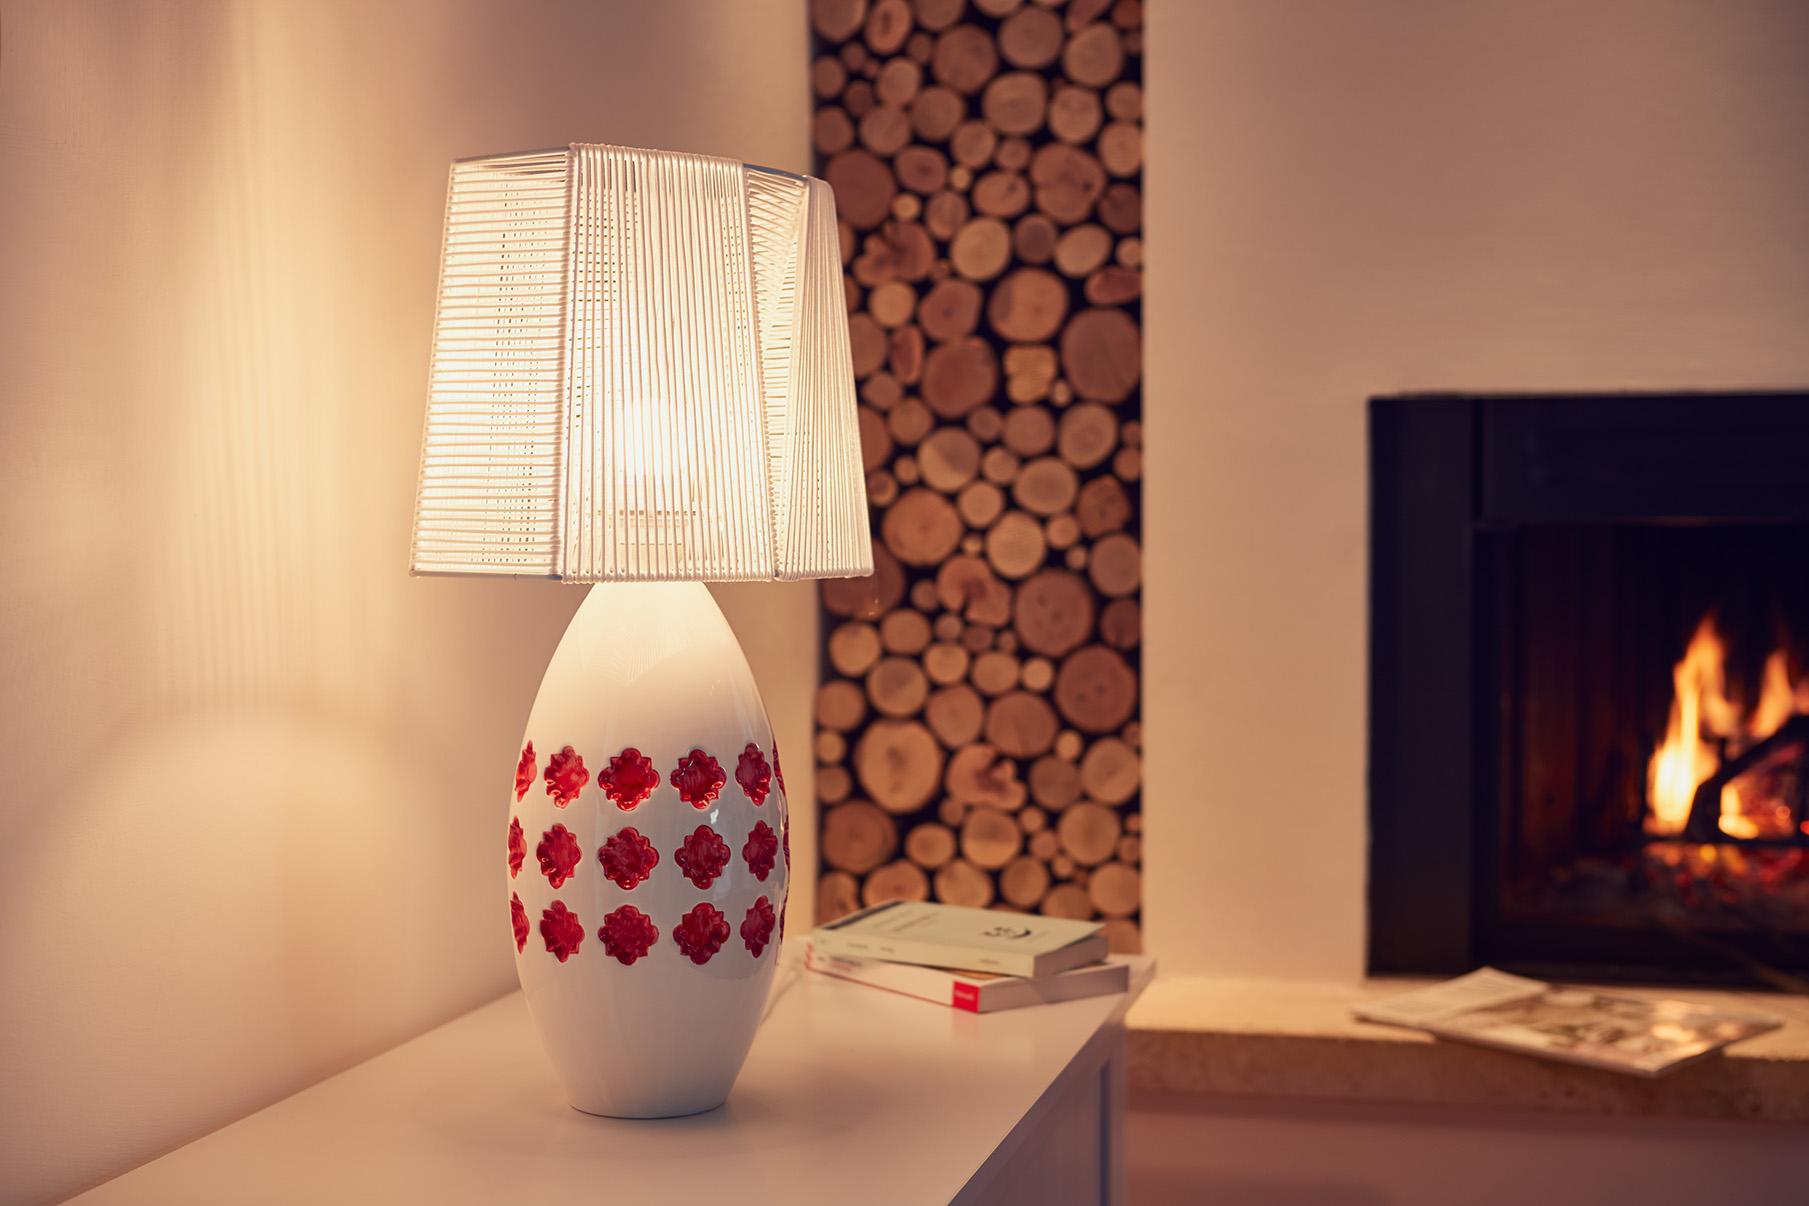 Lamp Lampada In CeramicaPink Materia Da Articity Tavolo 7ybfgY6